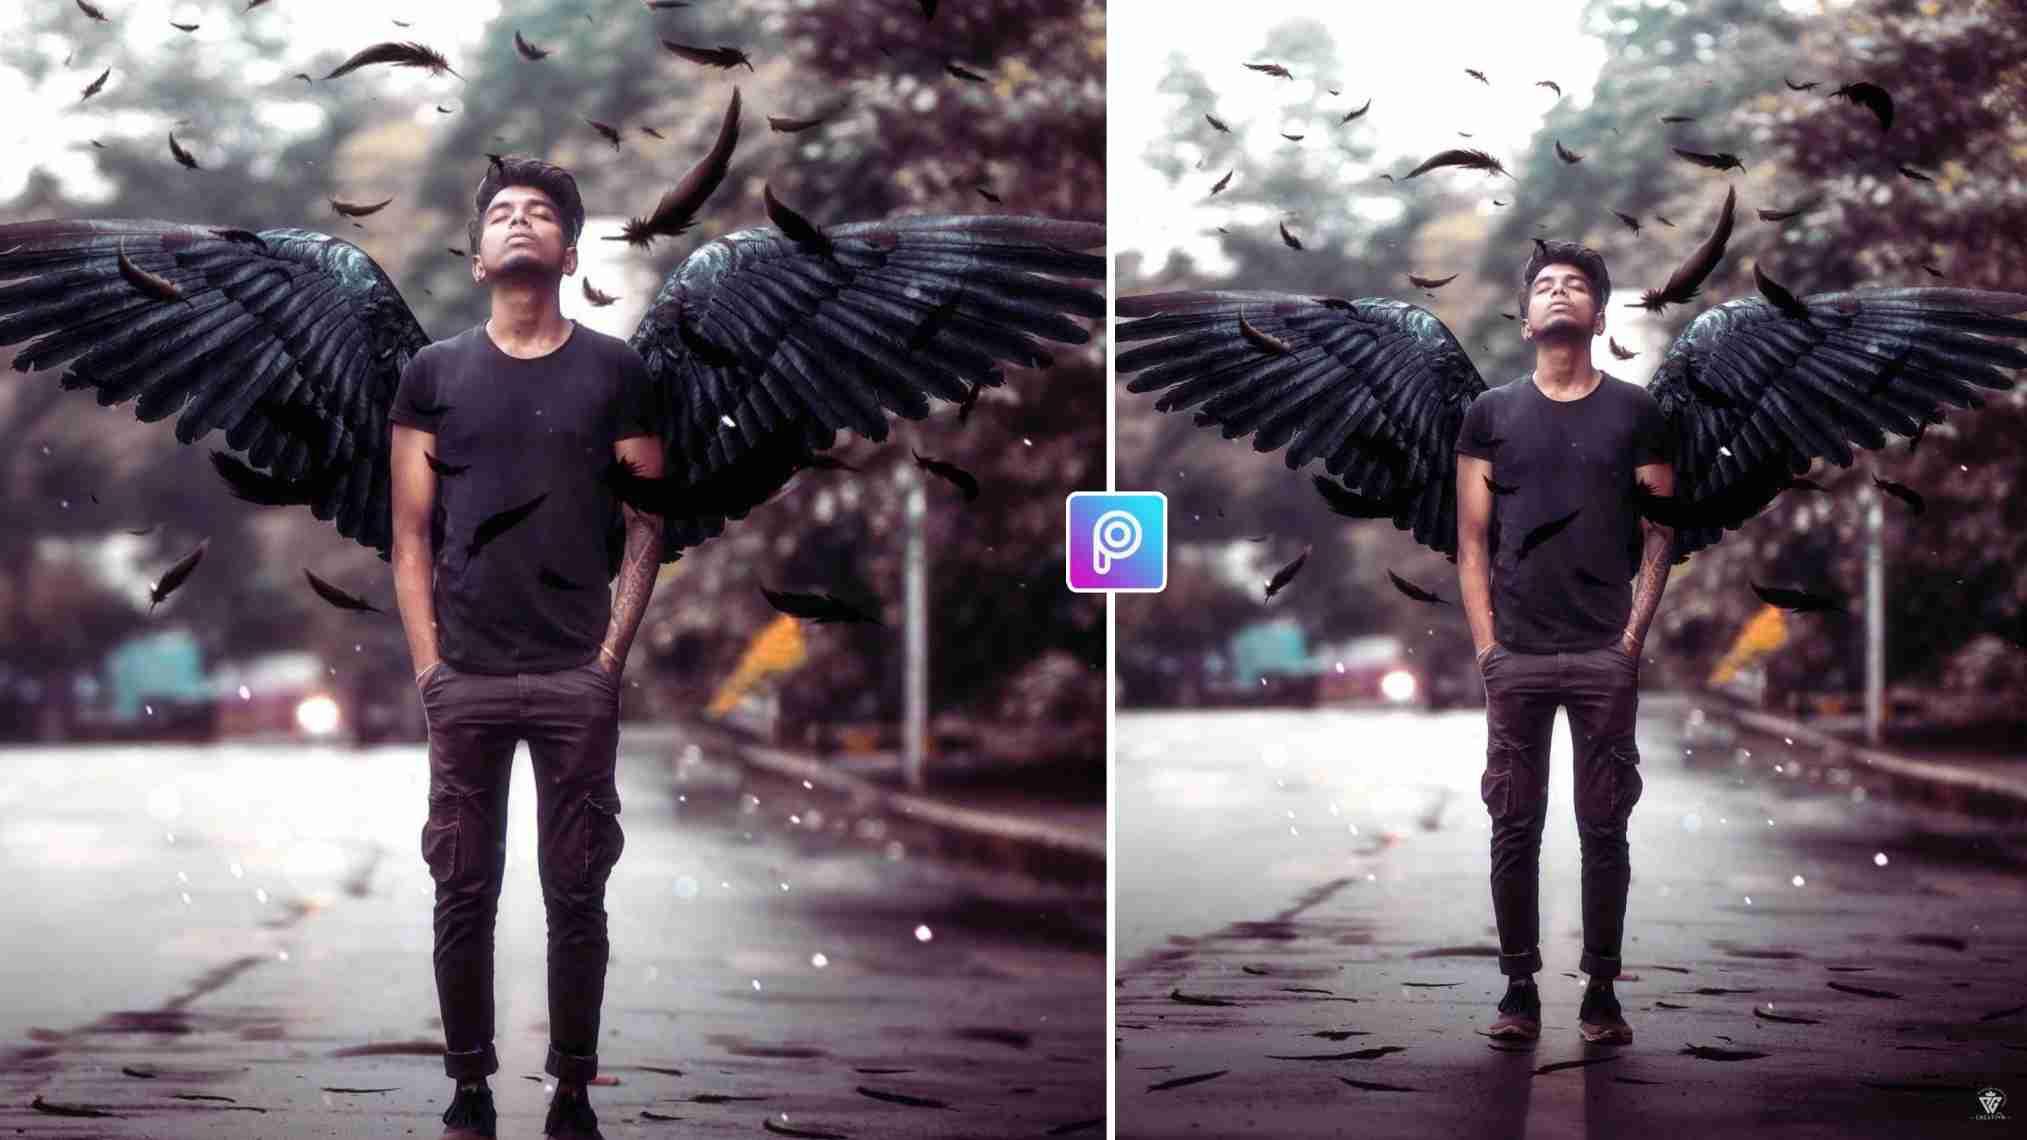 Devil Wings Photo Editing